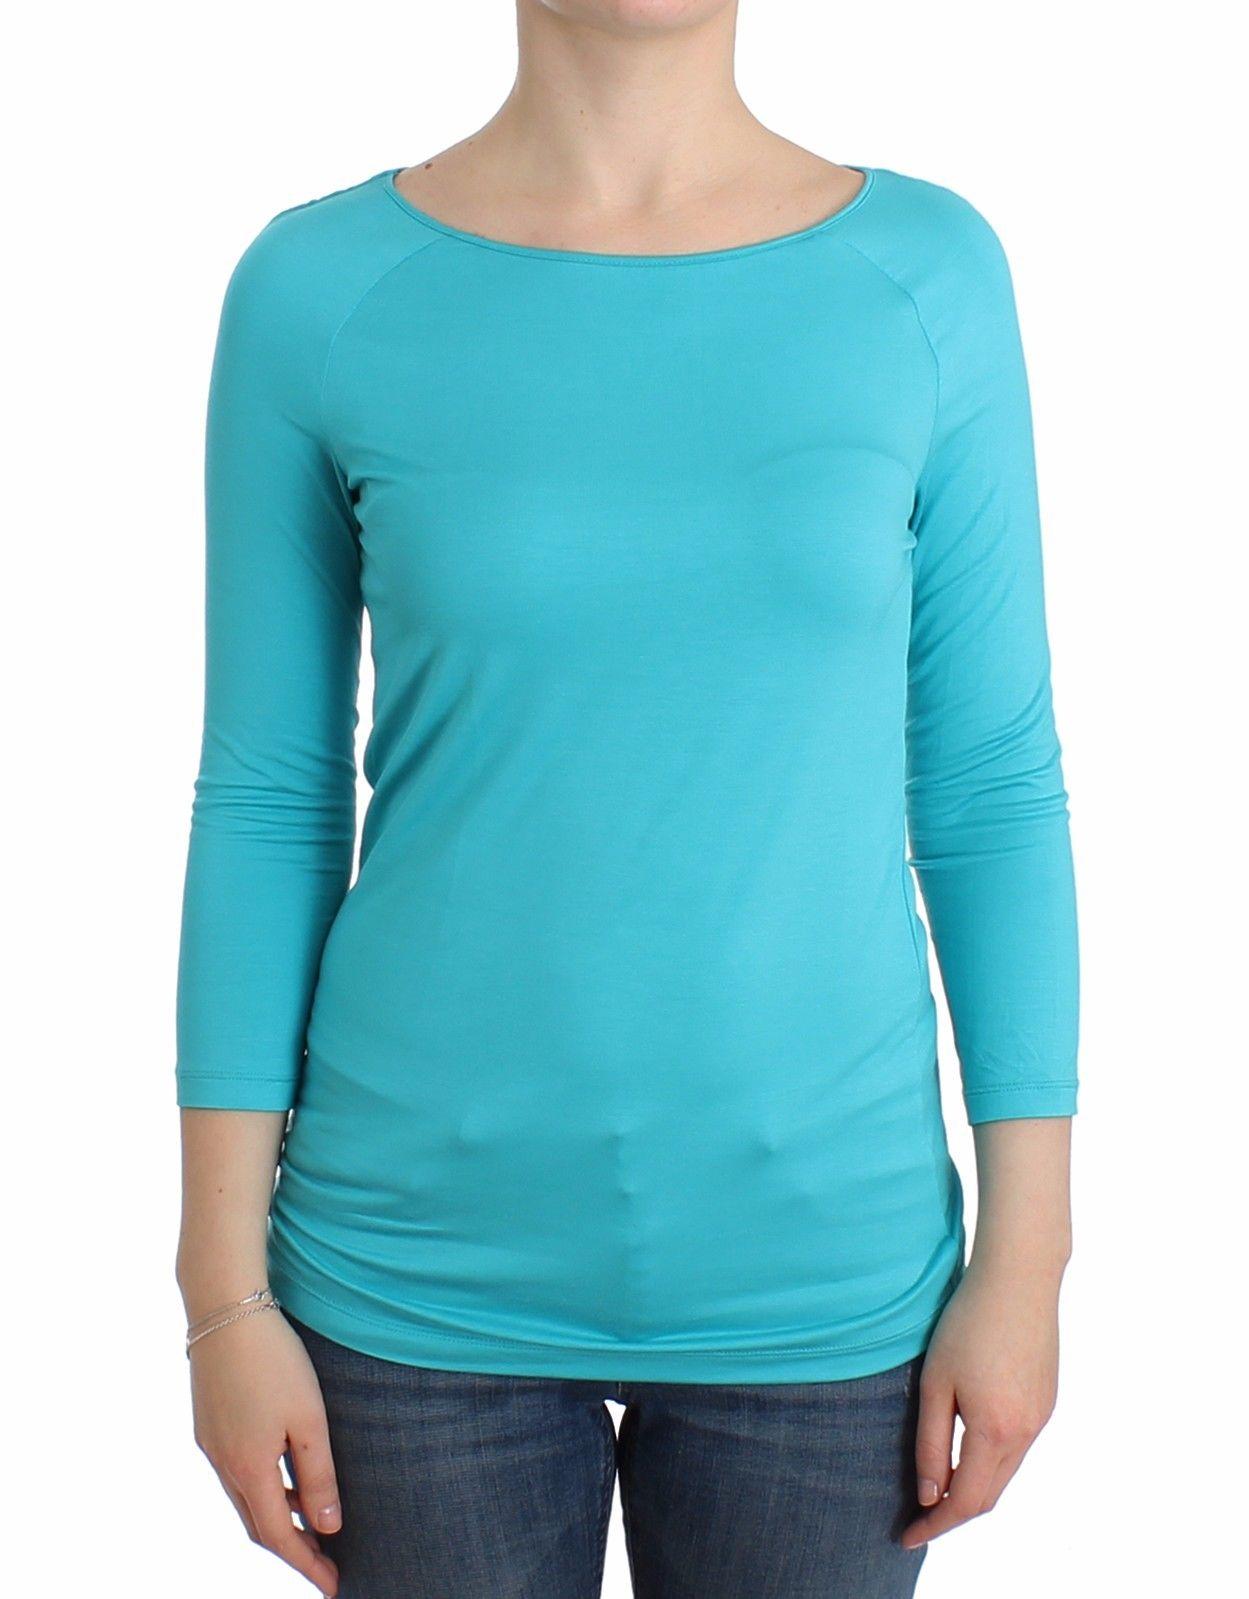 Ermanno Scervino Women's Sweater Blue SIG12009 - IT44 | M